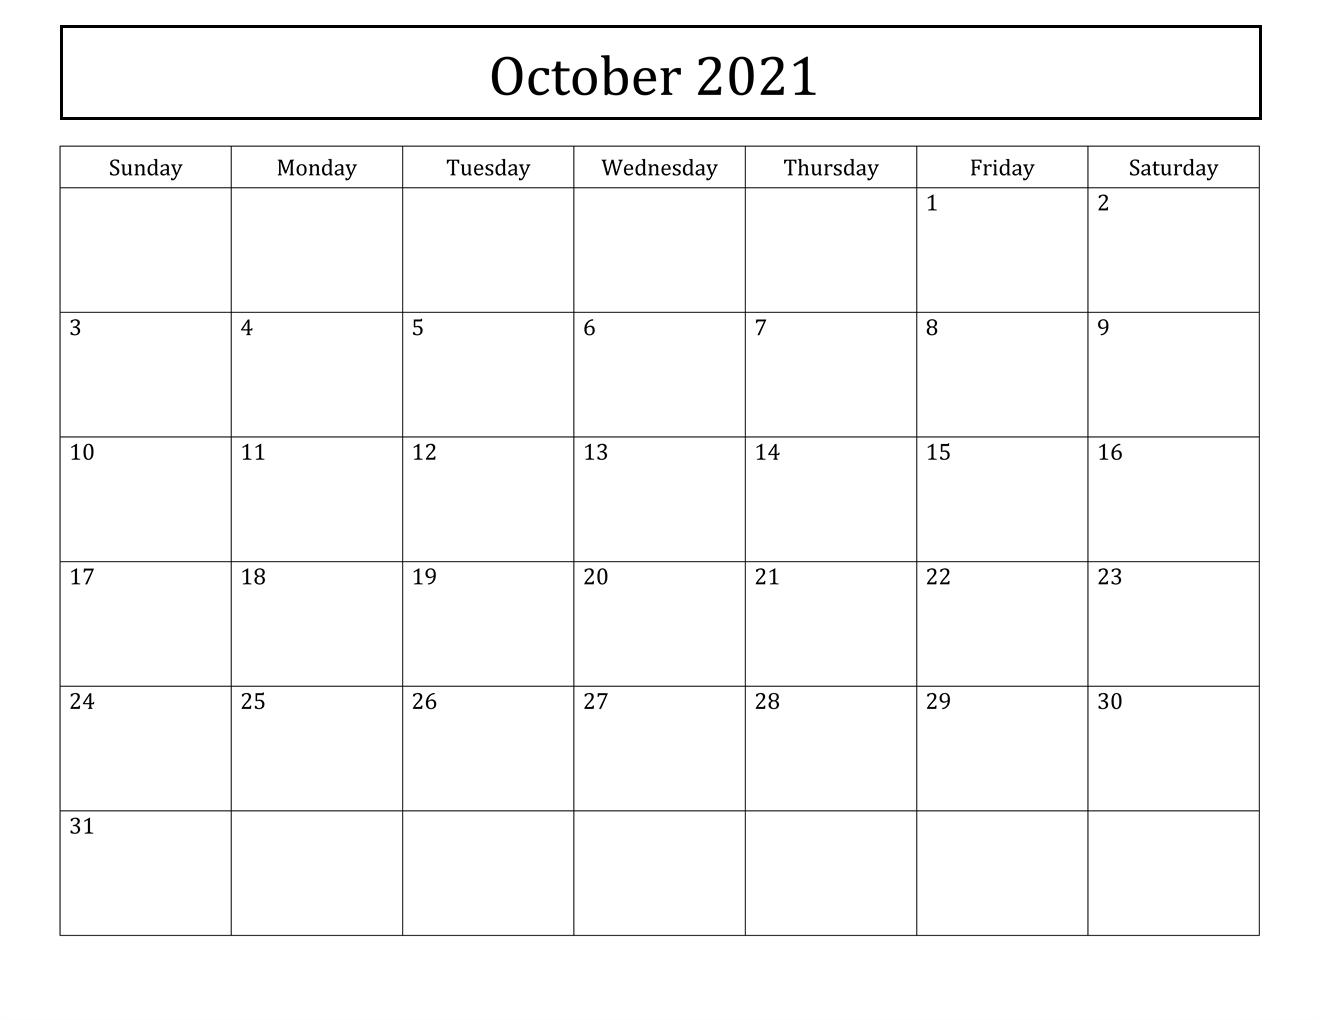 October 2021 Calendar With Festival